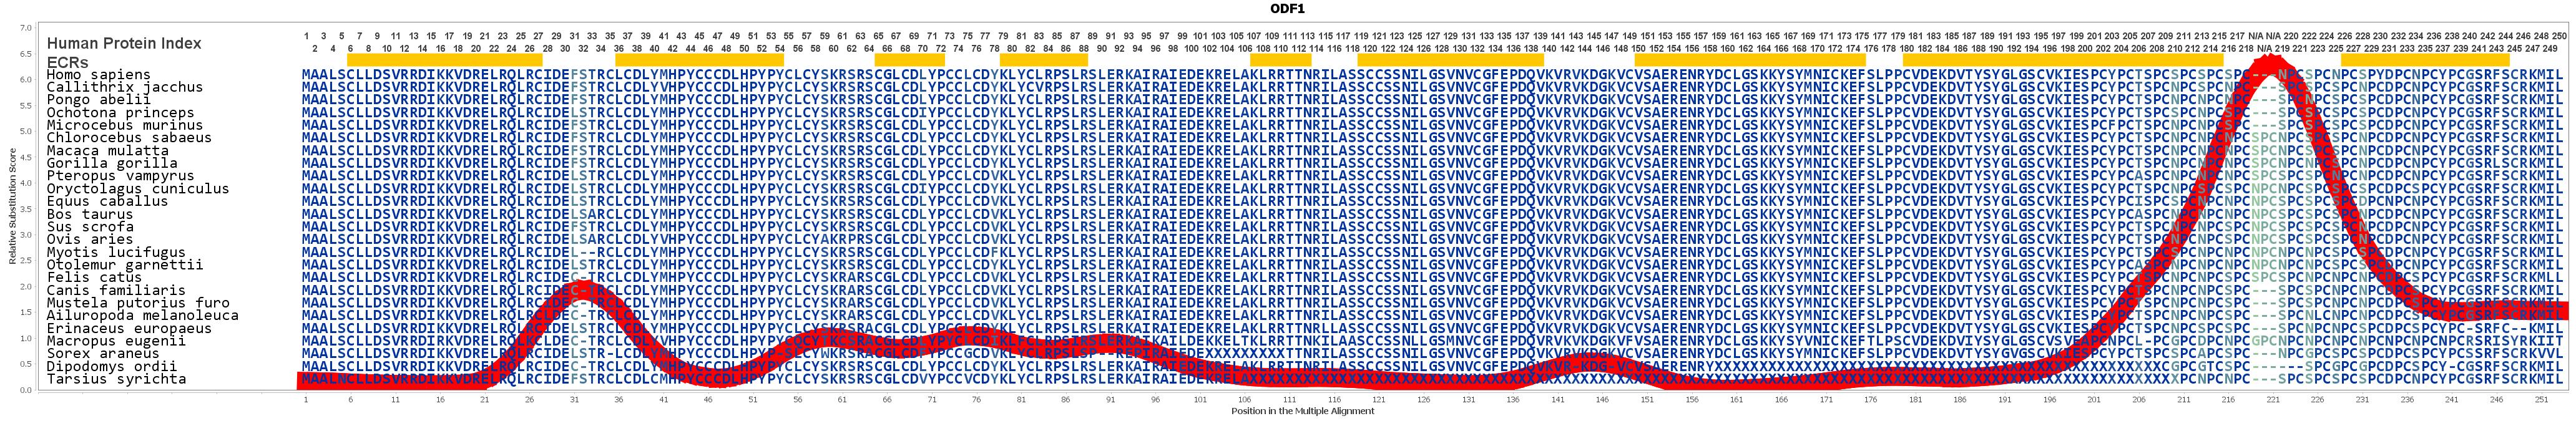 ODF1 Gene GeneCards ODFP1 Protein